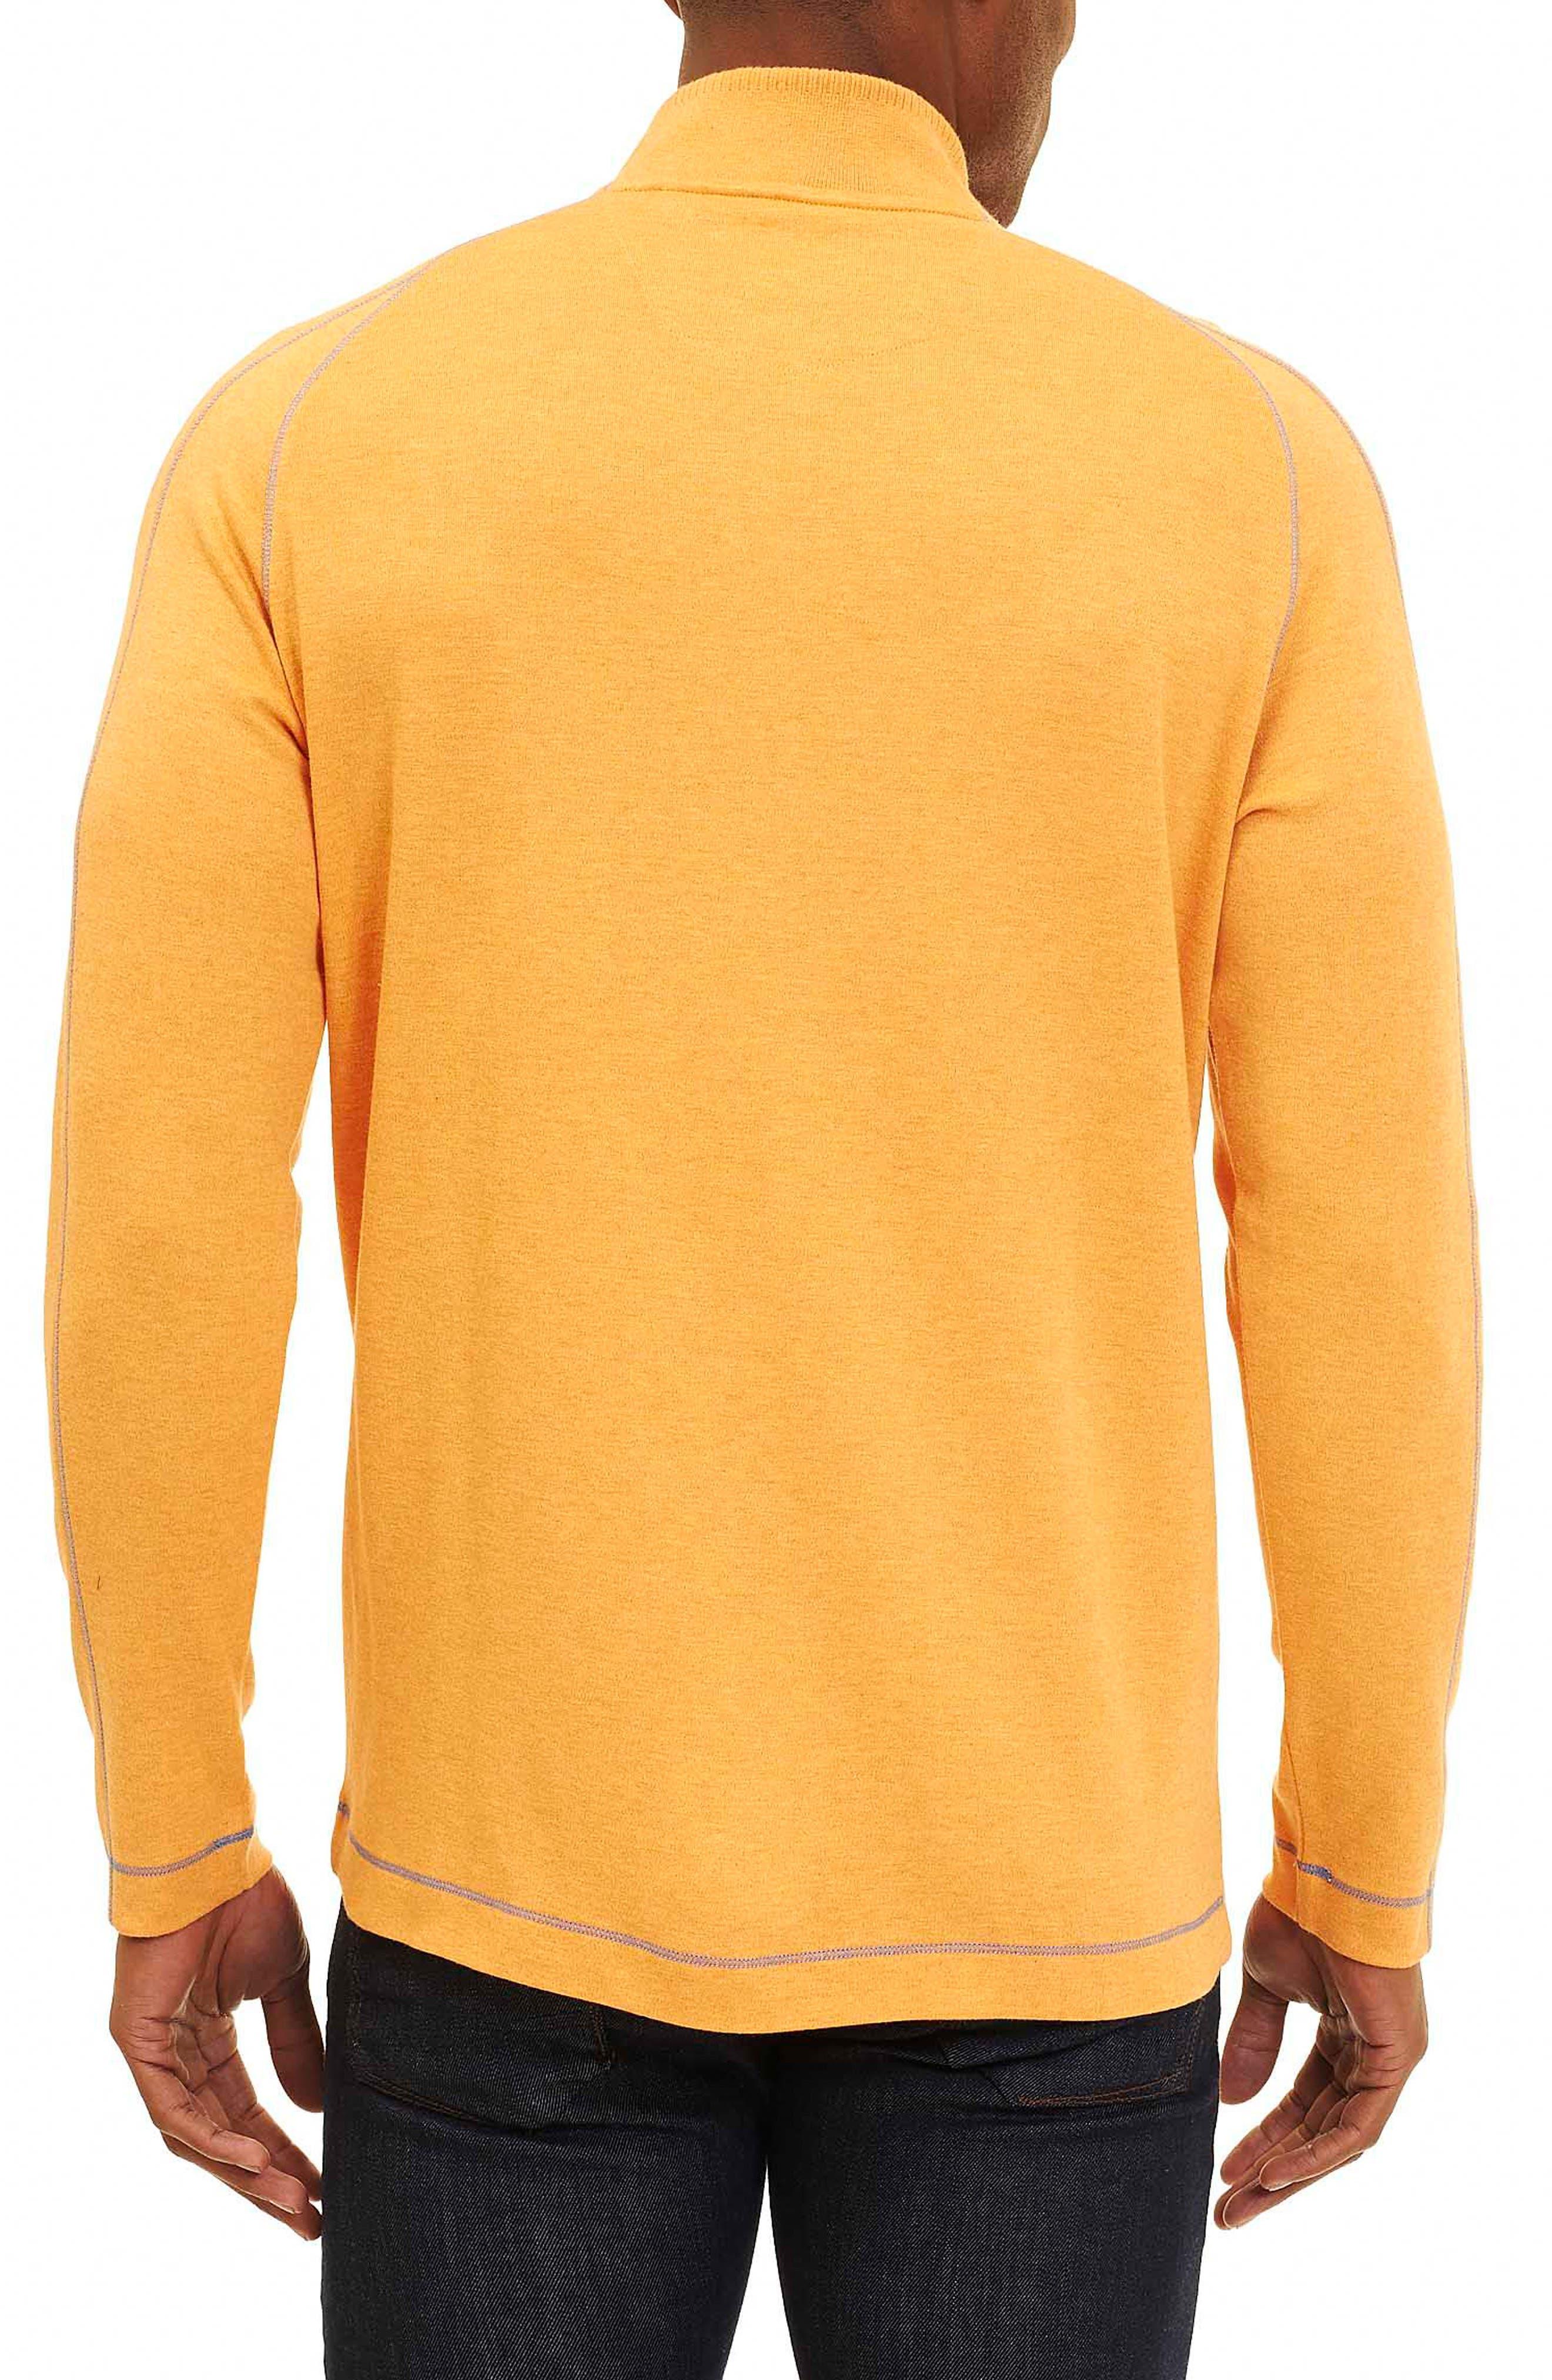 Alternate Image 2  - Robert Graham 'Elia' Regular Fit Quarter Zip Pullover